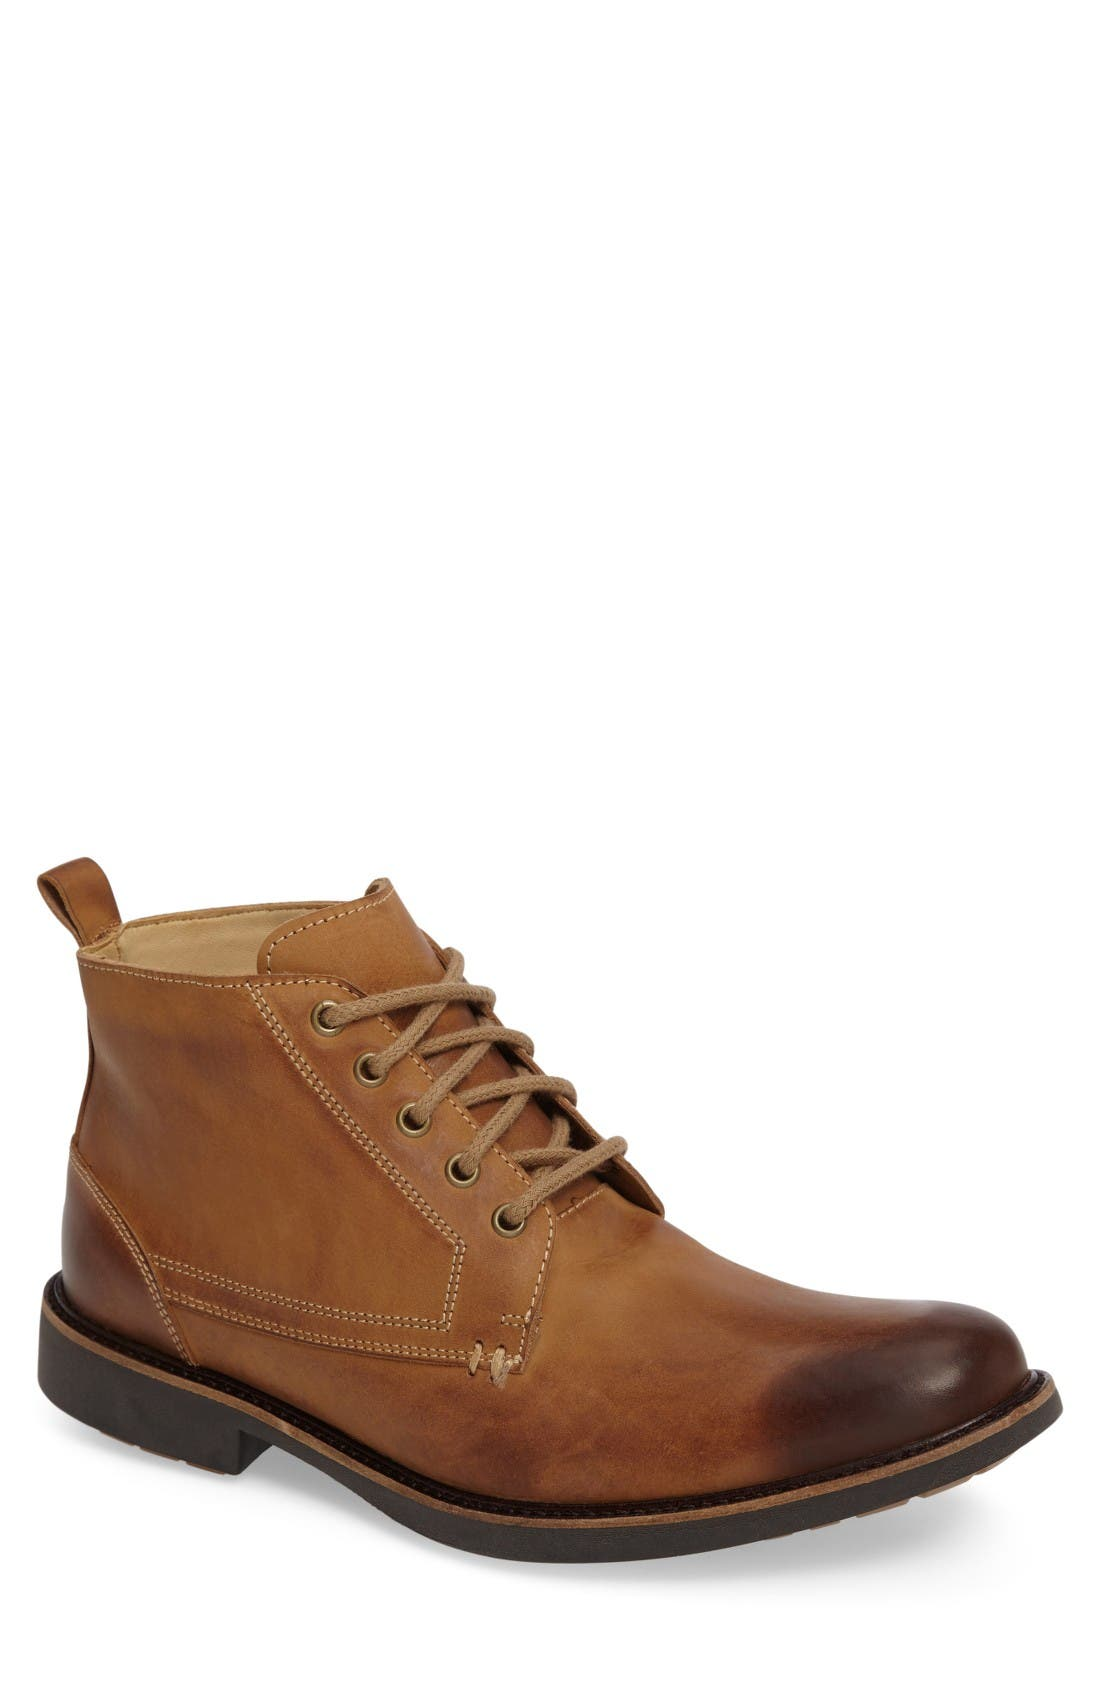 'Pedras' Boot,                             Main thumbnail 1, color,                             Castor Leather